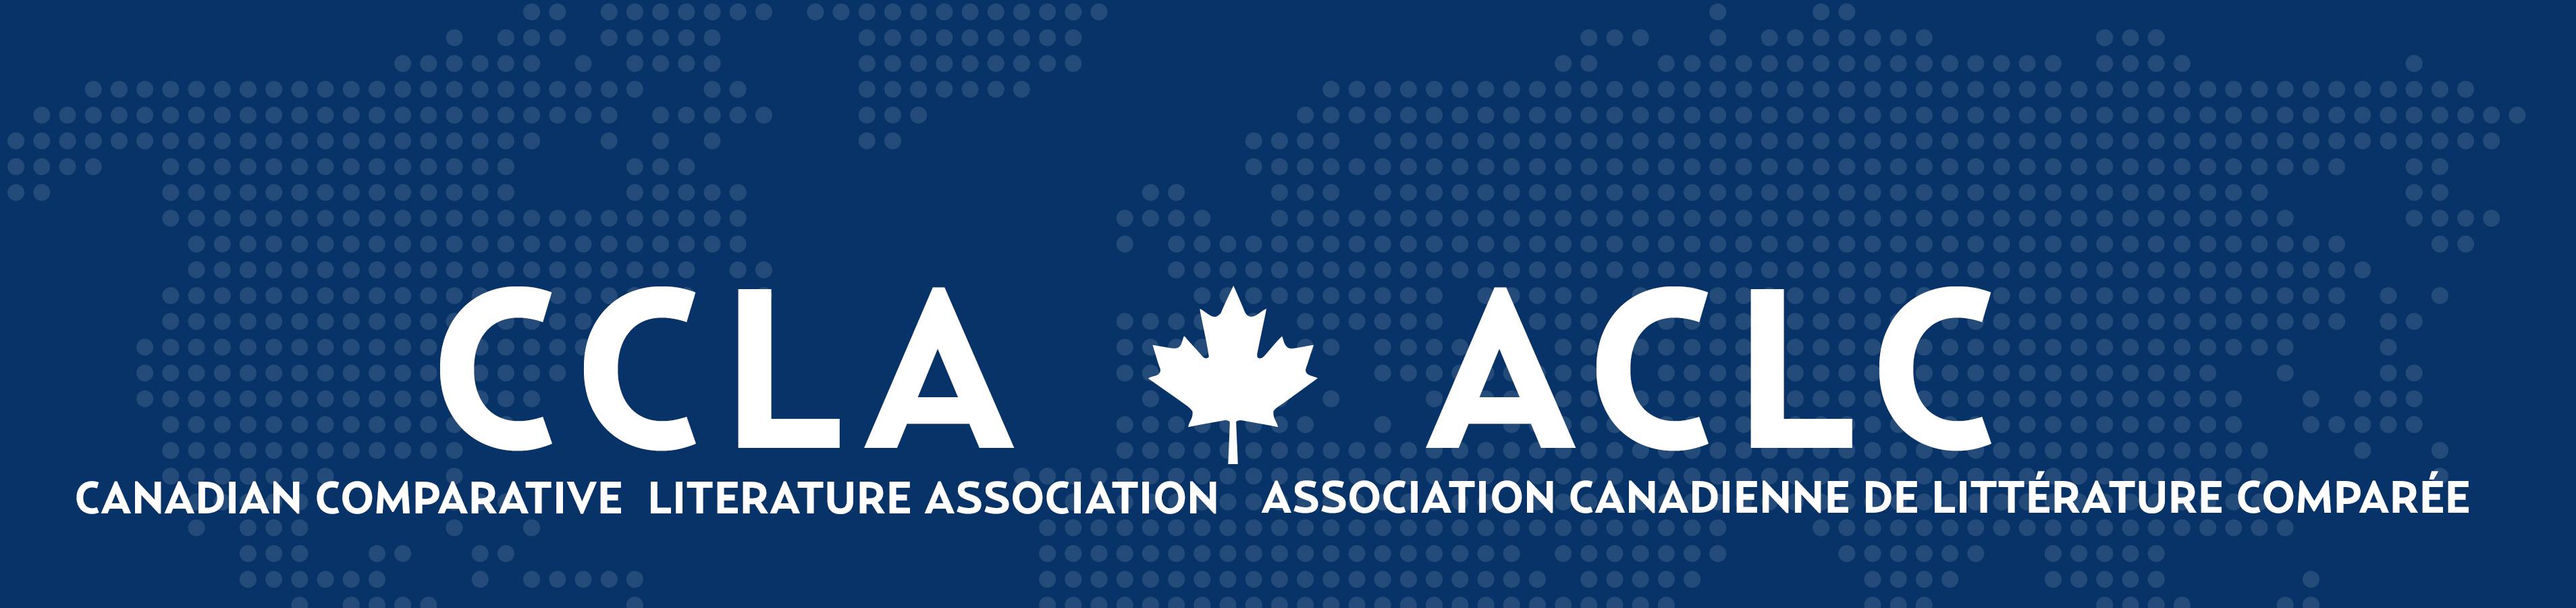 CCLA | ACLC